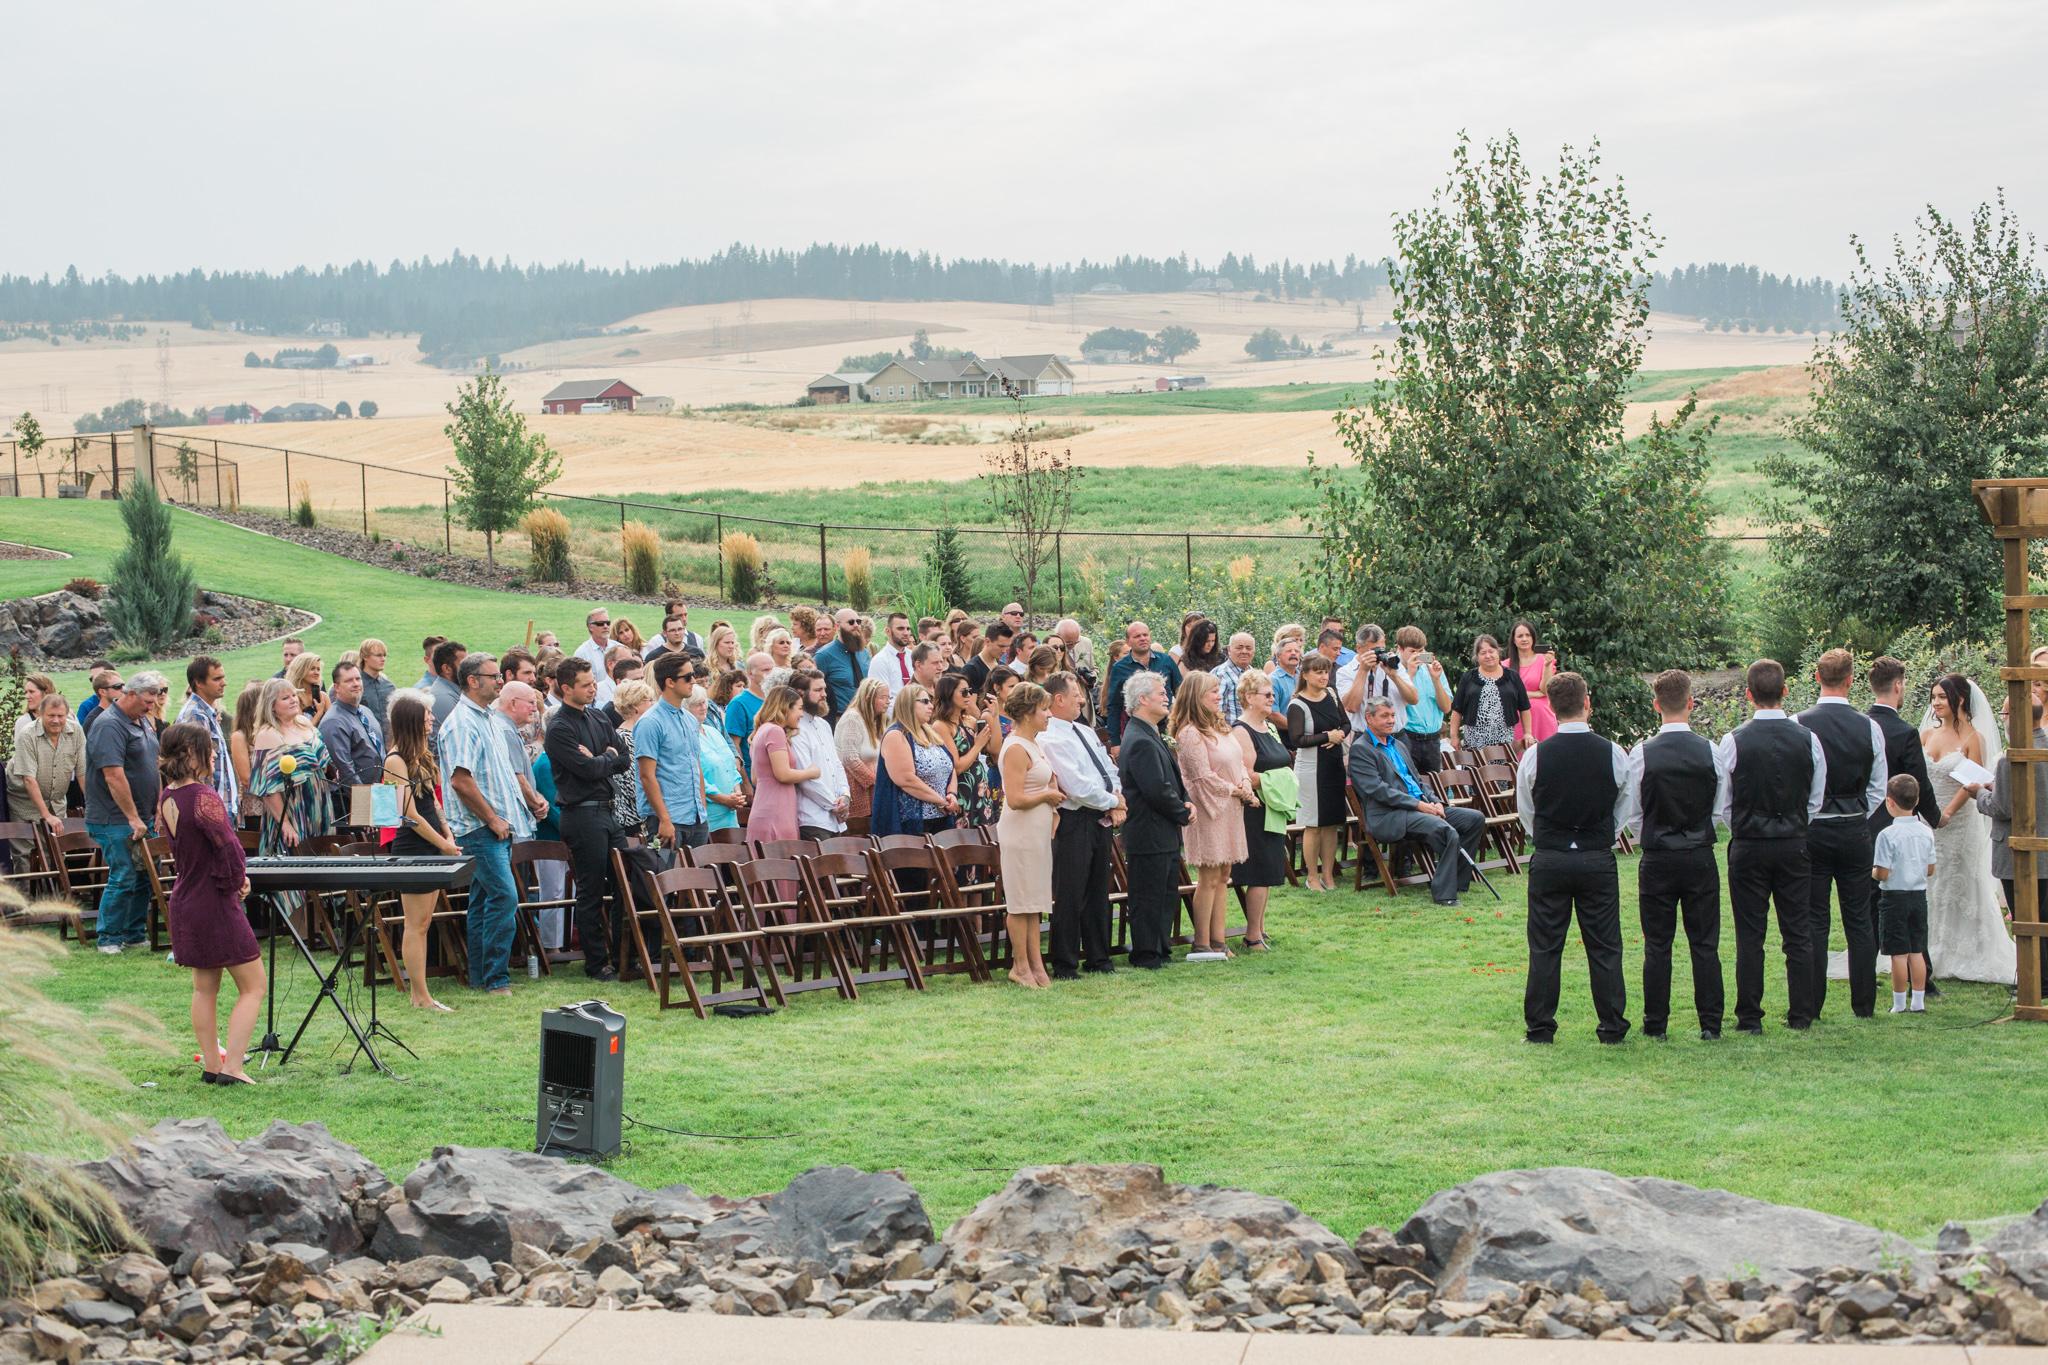 Olga_janni_wedding_090917_WEBSIZE (315 of 704).JPG